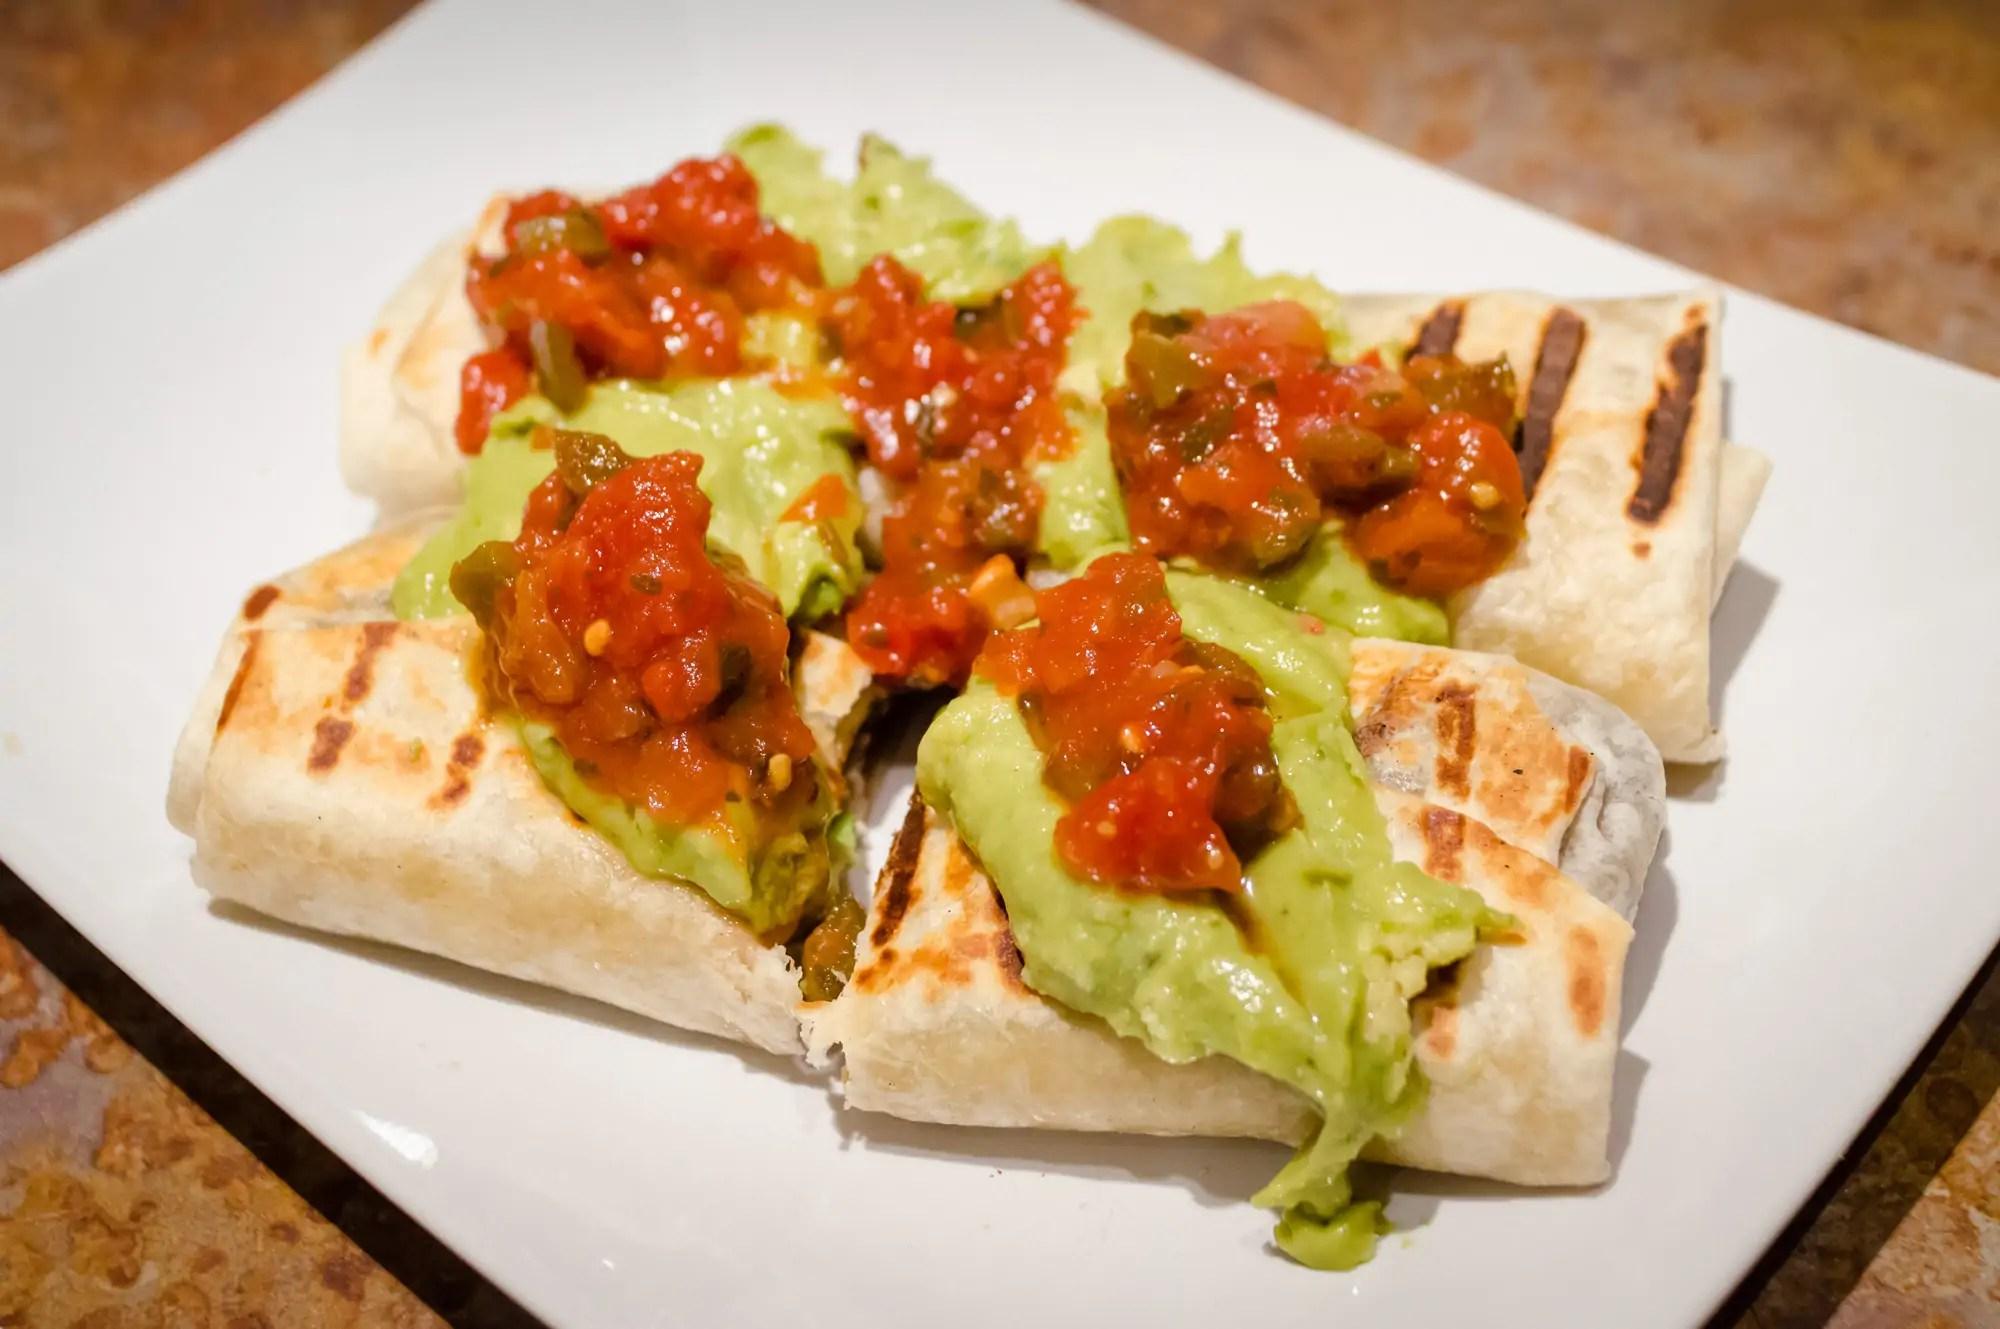 Crispy burritos on the plate